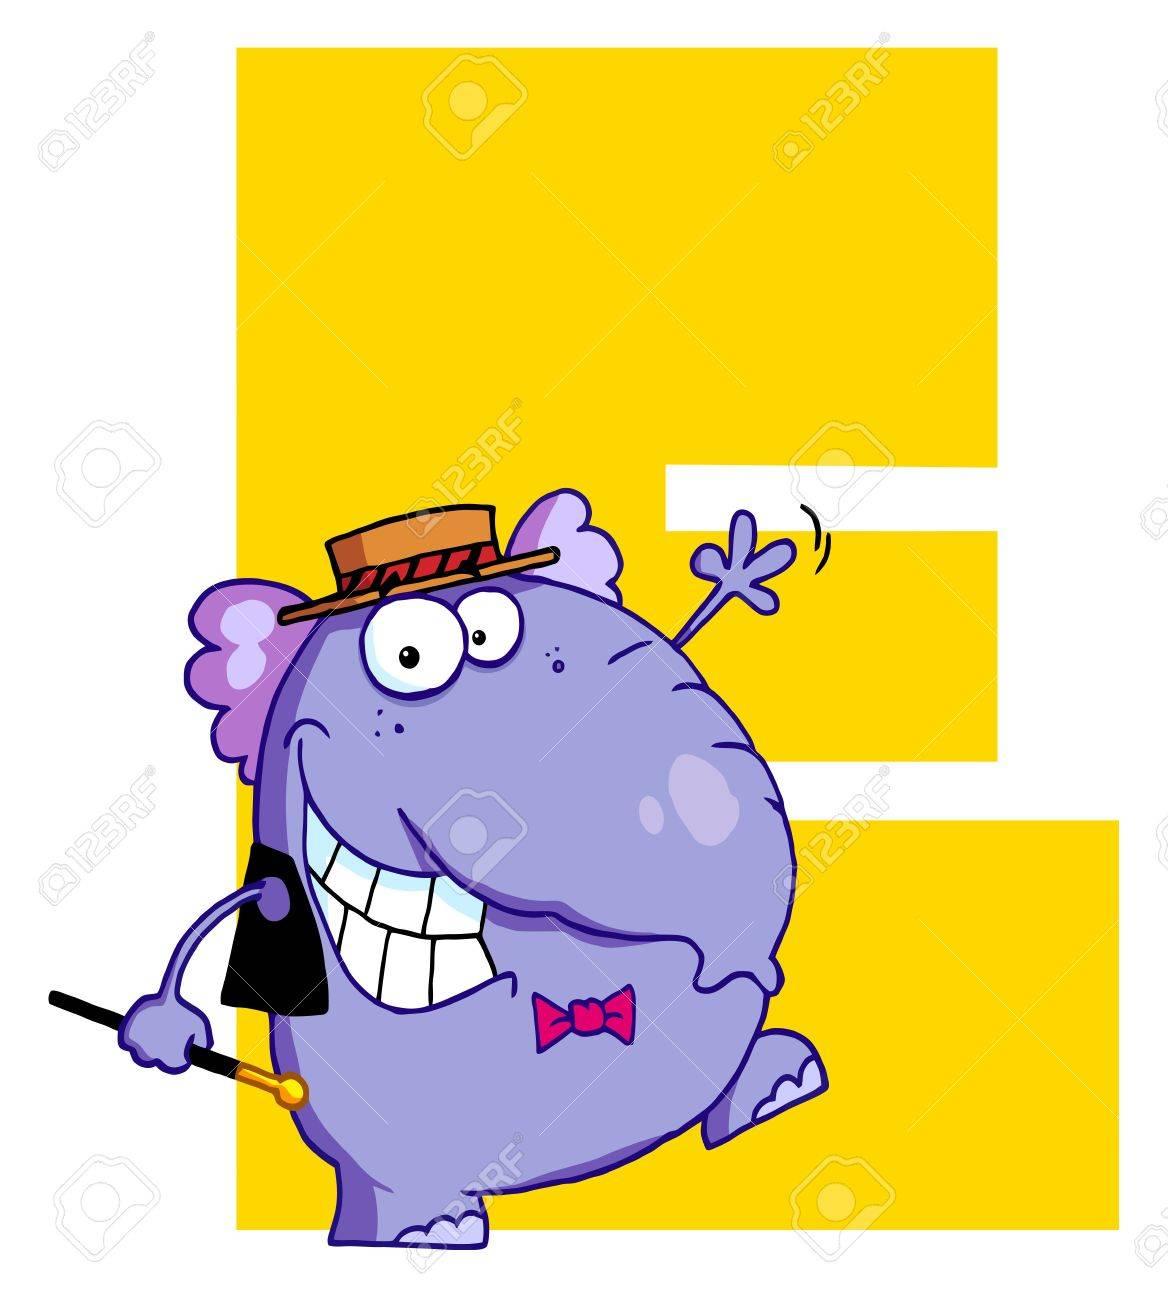 Funny cartoons alphabet e royalty free cliparts vectors and stock funny cartoons alphabet e stock vector 7260444 altavistaventures Gallery